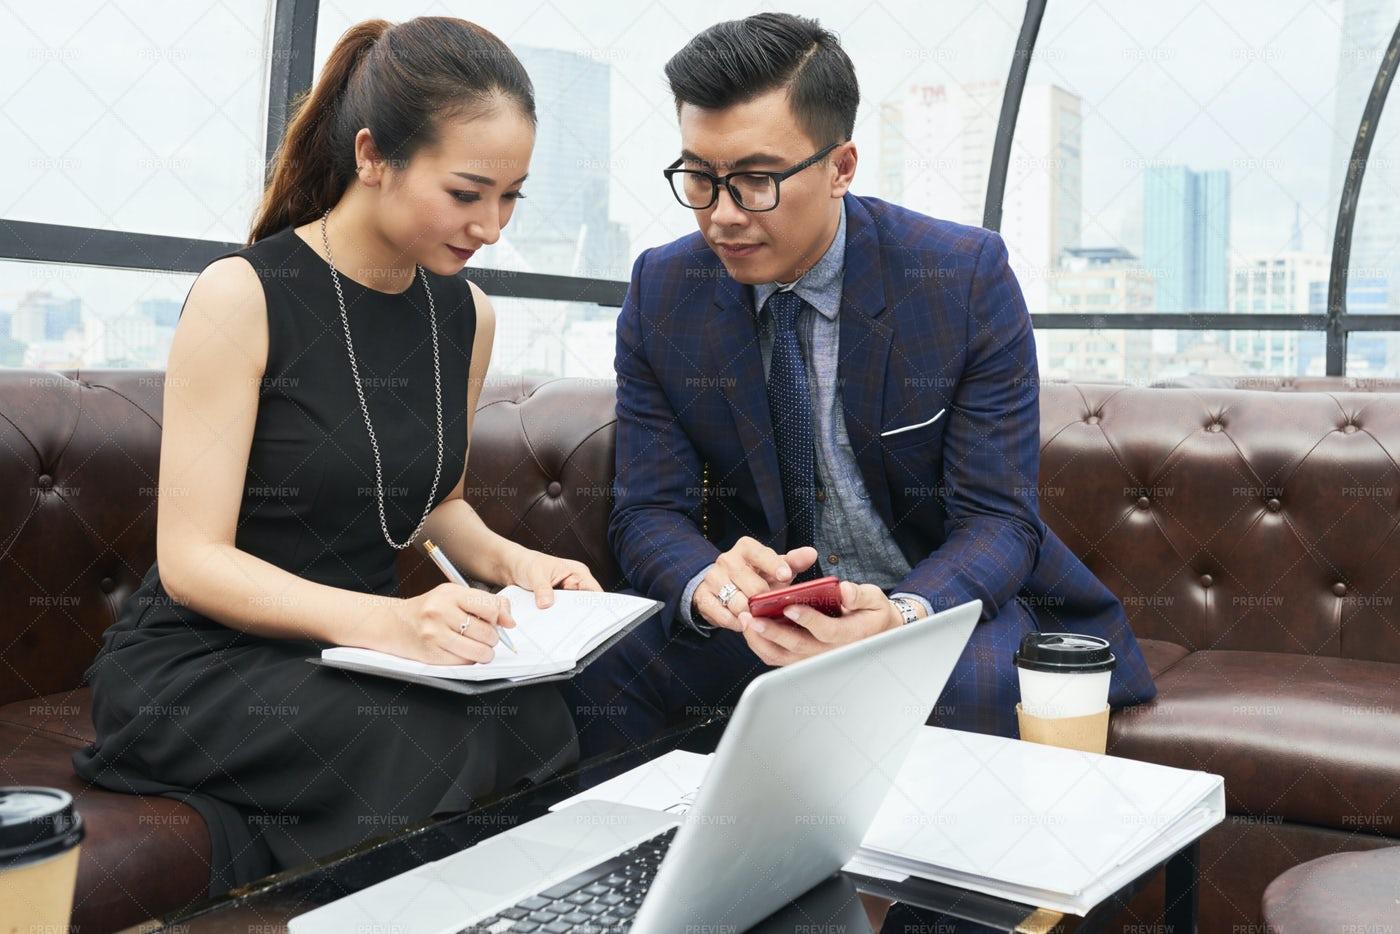 Discussing Company Development Plan: Stock Photos